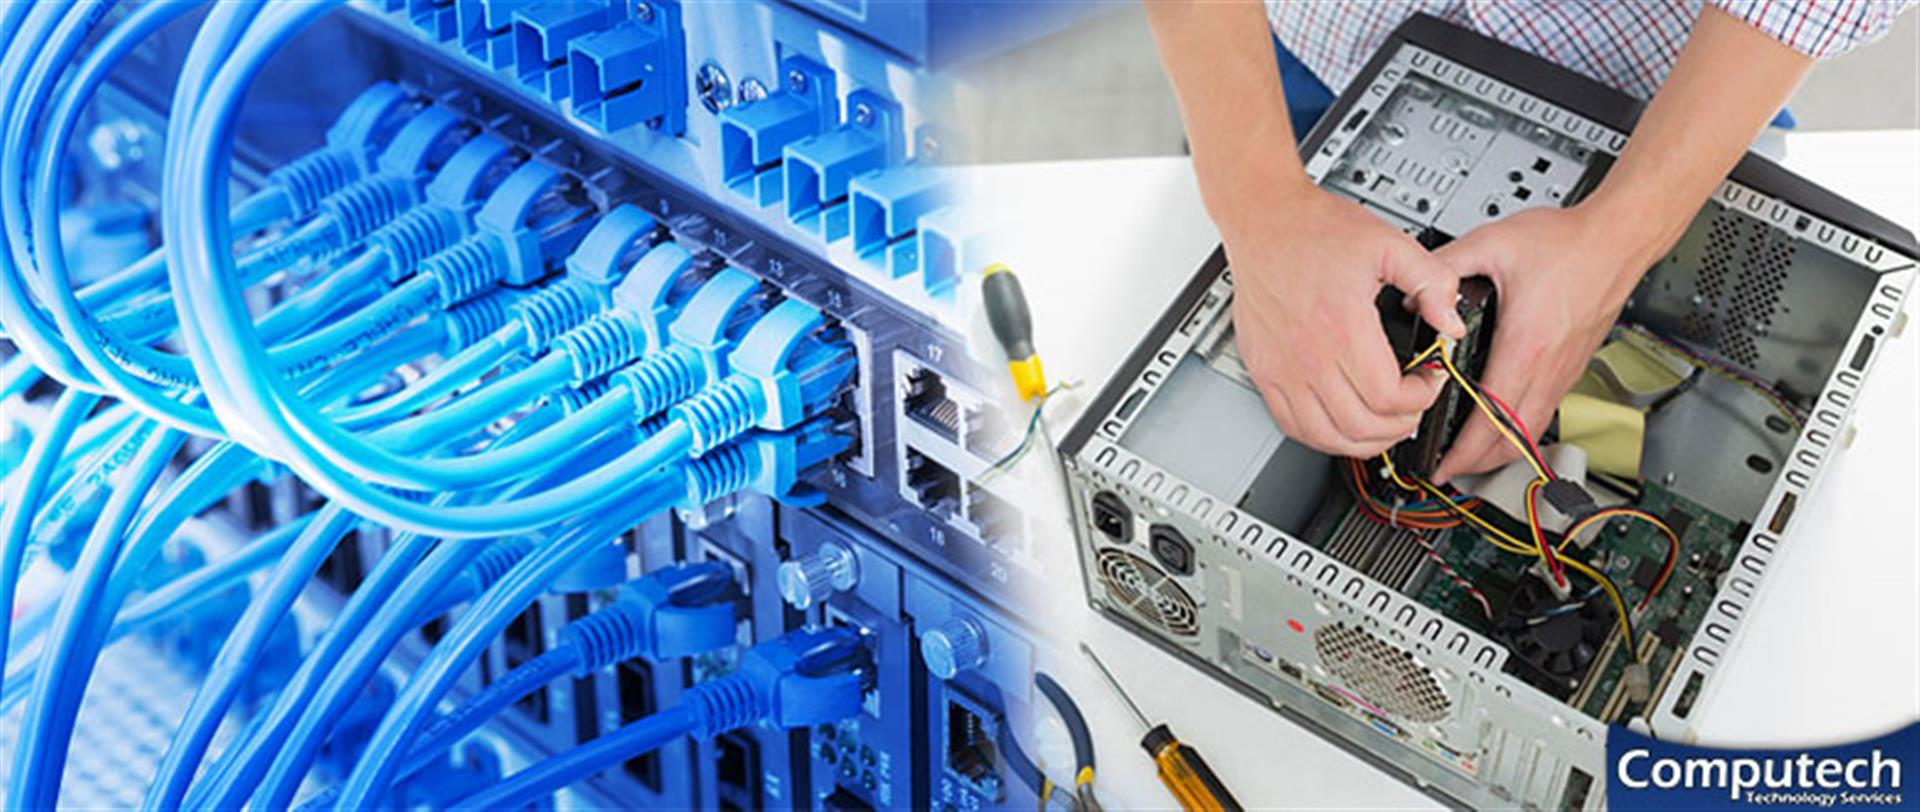 Jemison Alabama On Site PC & Printer Repair, Networking, Telecom & Data Wiring Services